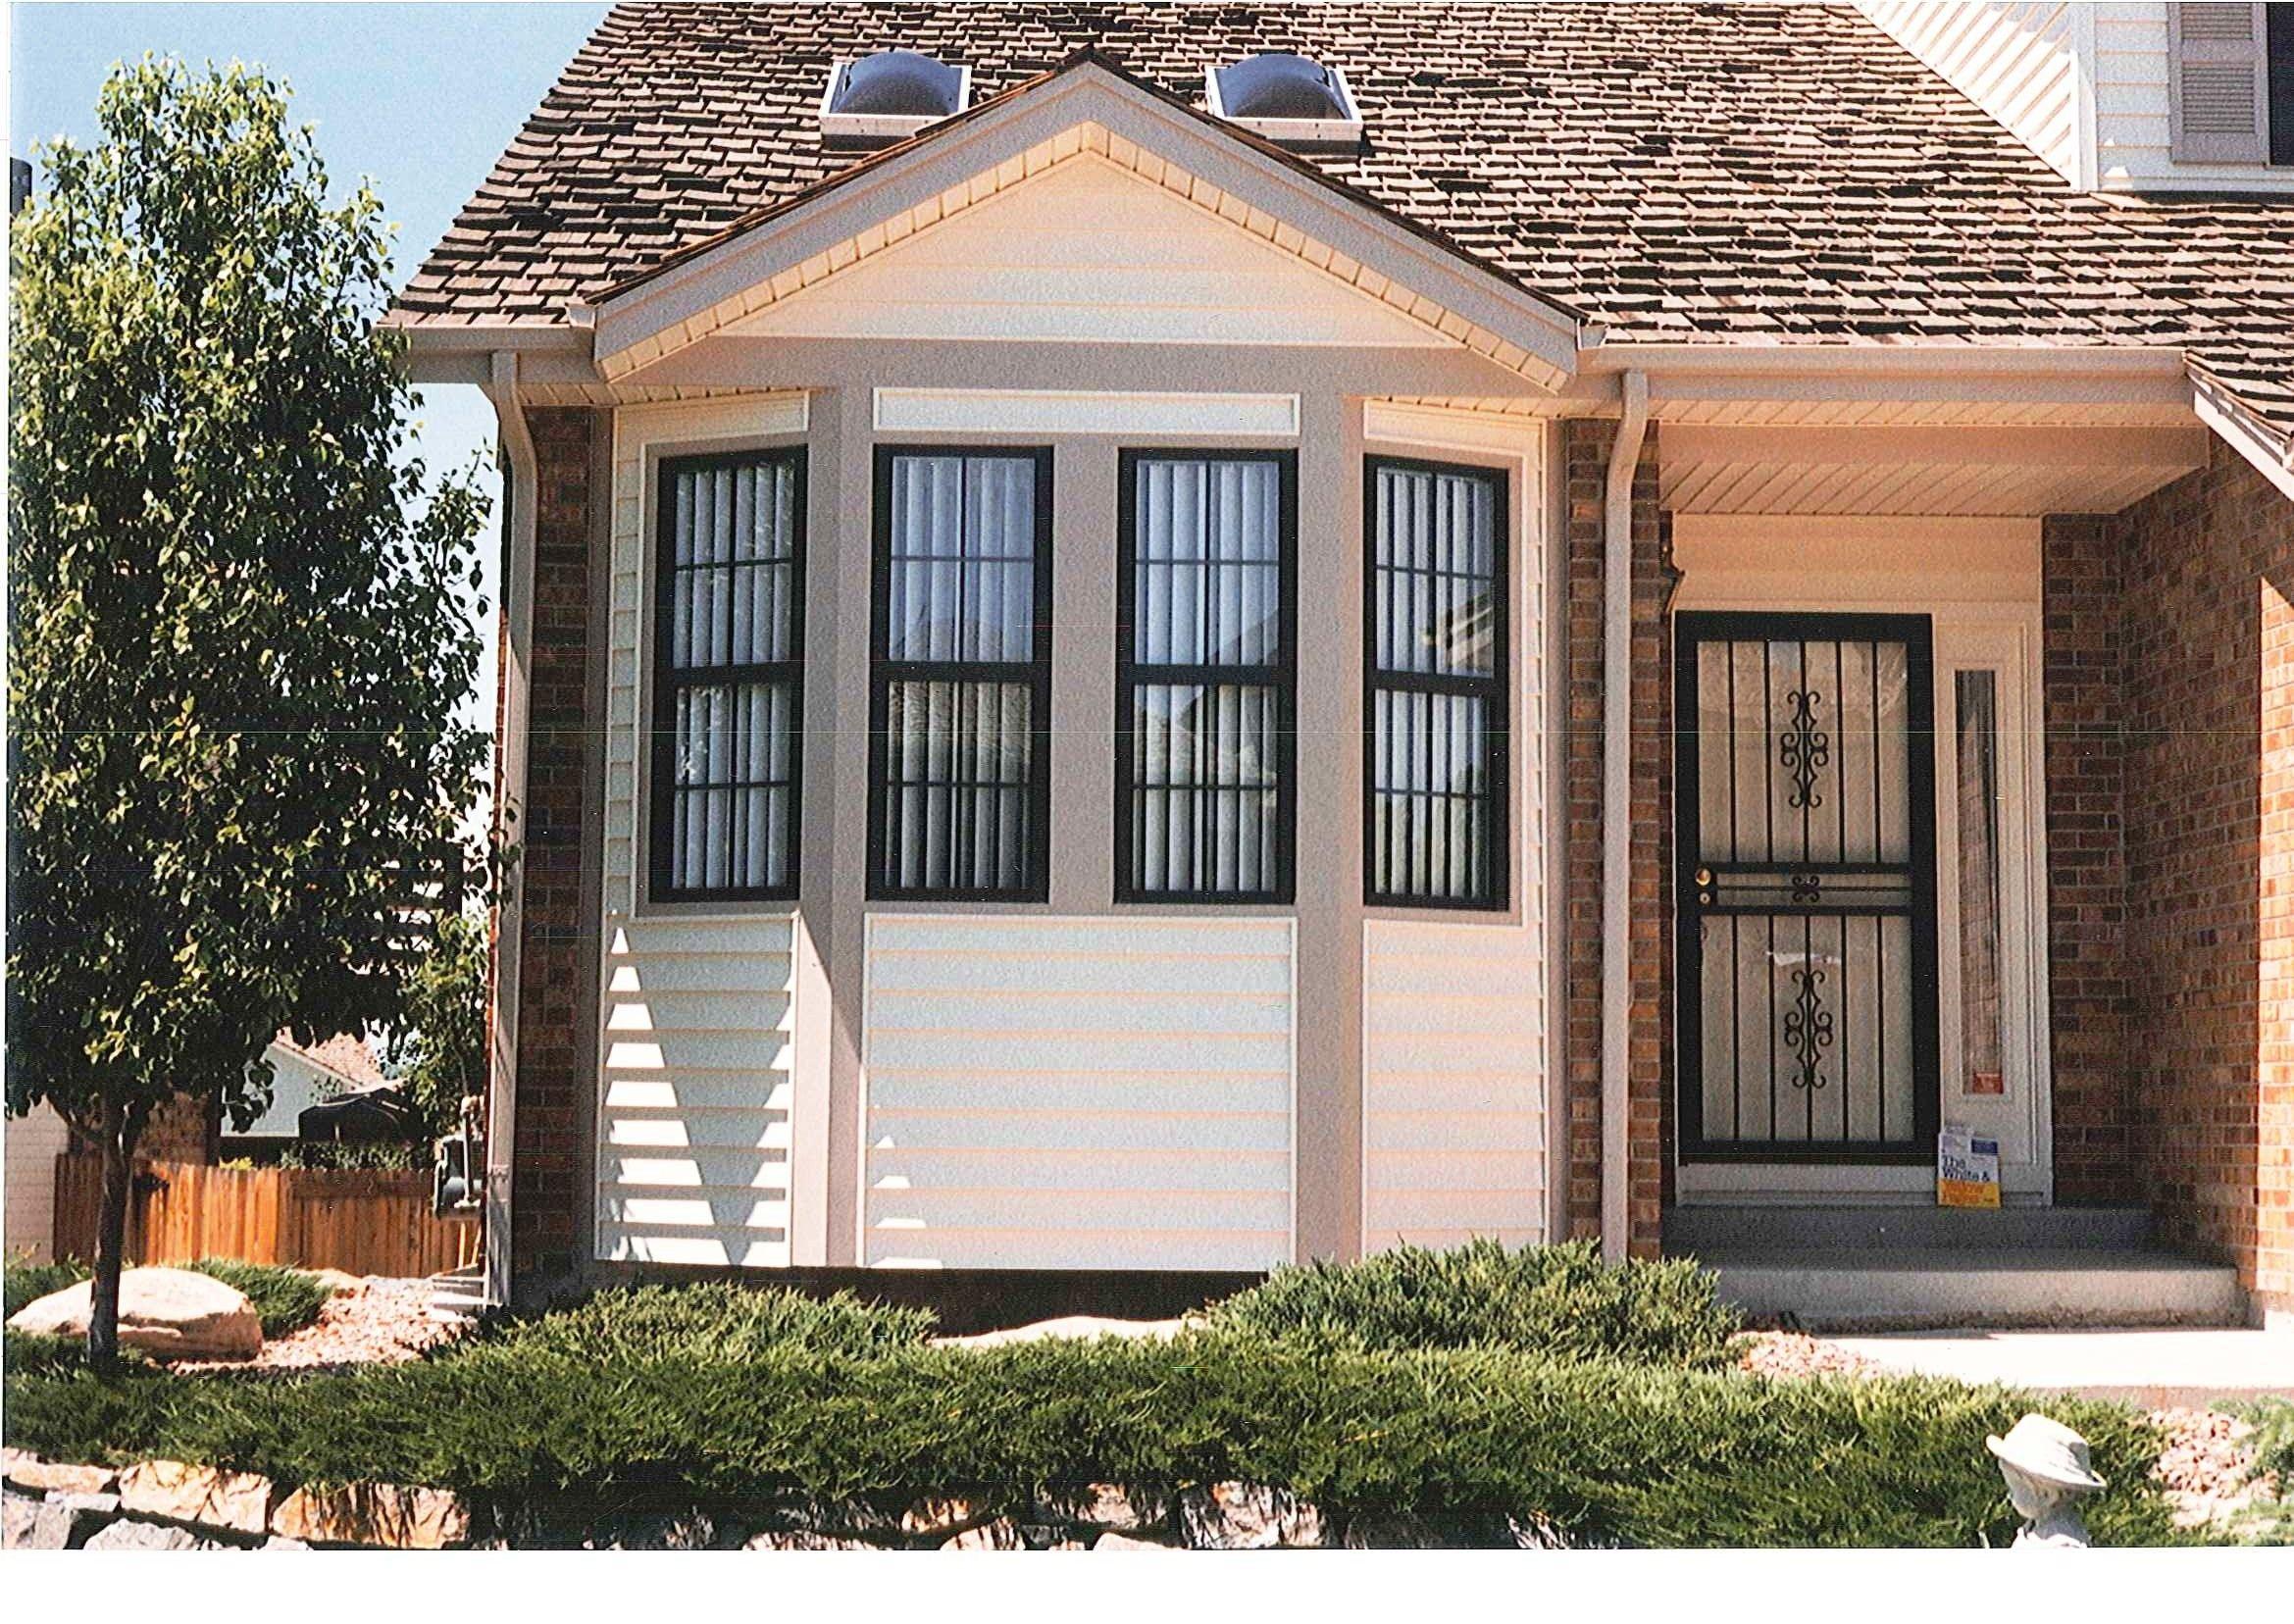 bay window siding options denver home window installation bay window siding options denver home window installation services